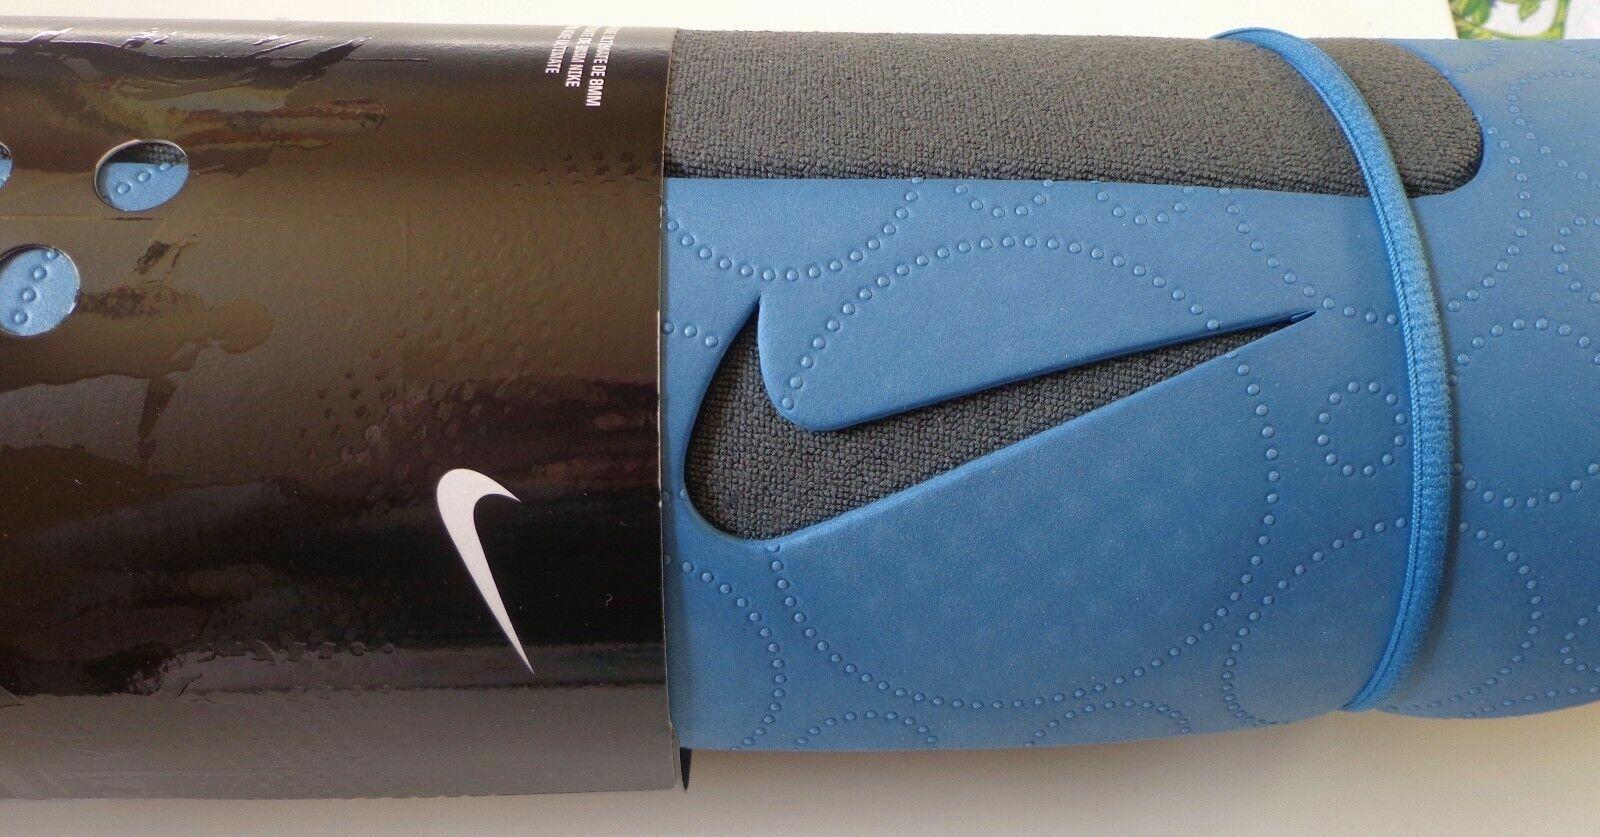 Nike Ultimate Yoga Pilates Mat 8mm Color Shade Blue Anthracite For Sale Online Ebay